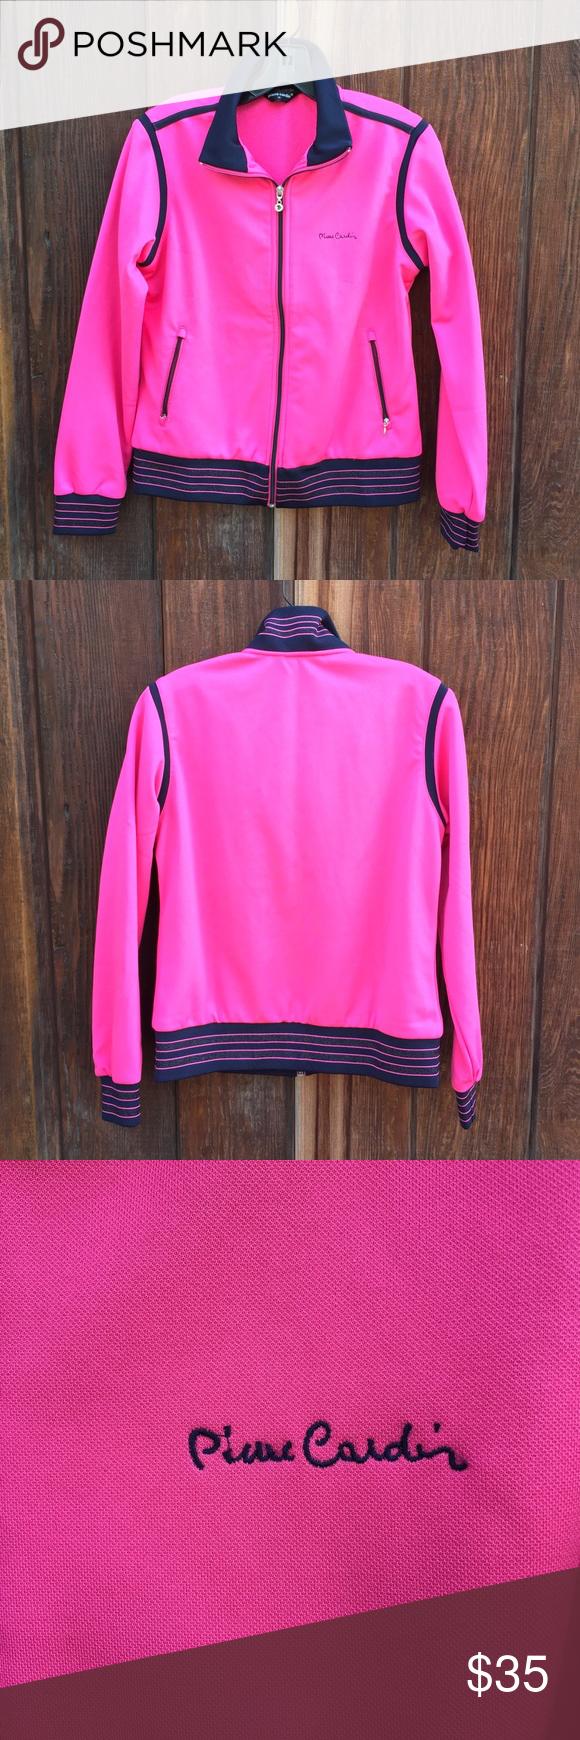 Pierre Cardin Track Jacket Fresh And Fancy Hot Pink Pierre Cardin Track Jacket Ready For Those Chilly Evenings Back I Track Jackets Jackets Gym Shorts Womens